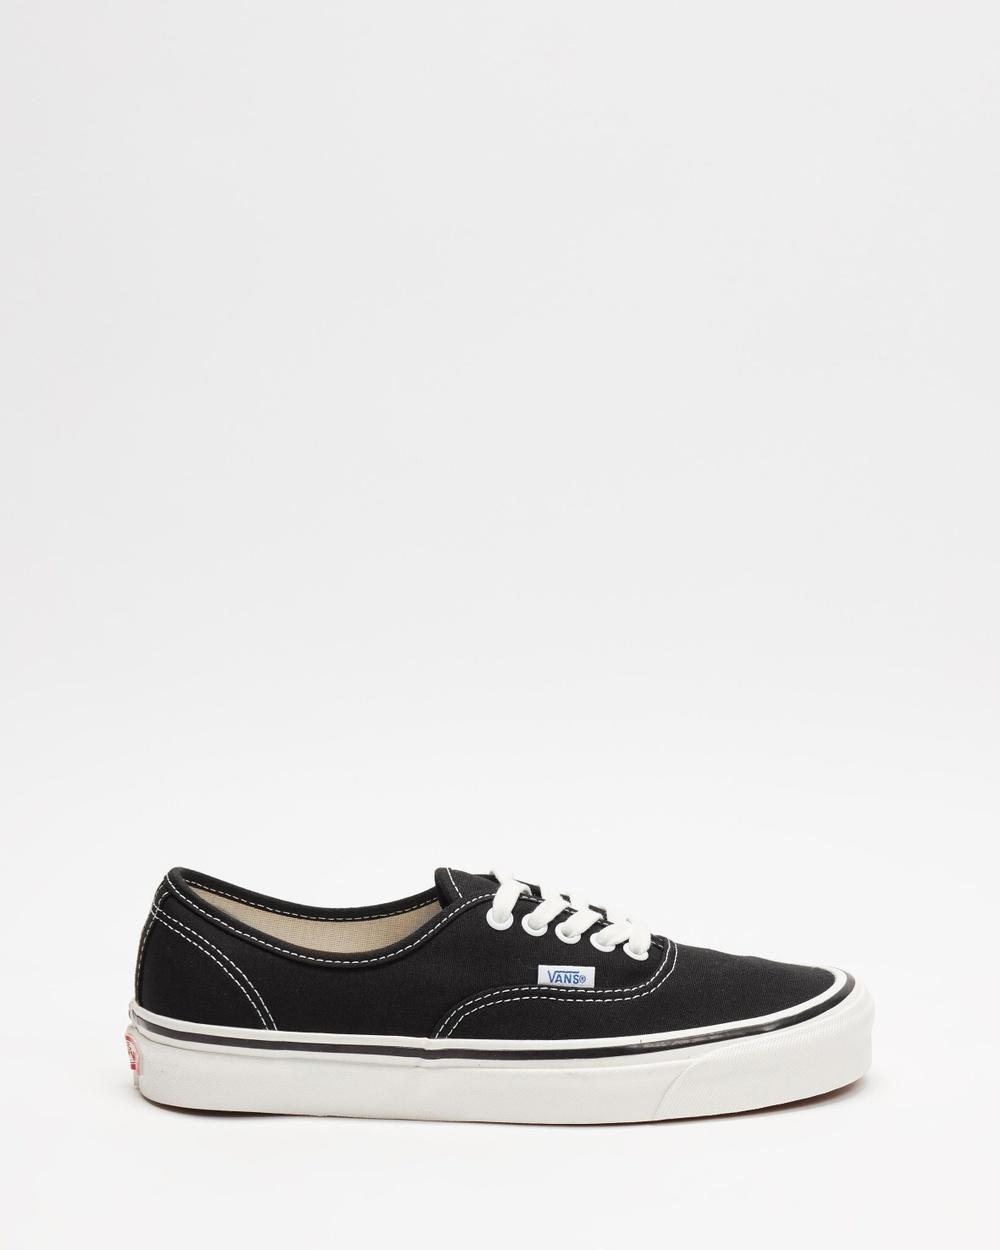 Vans Anaheim Authentic 44 DX Unisex Sneakers Black Australia